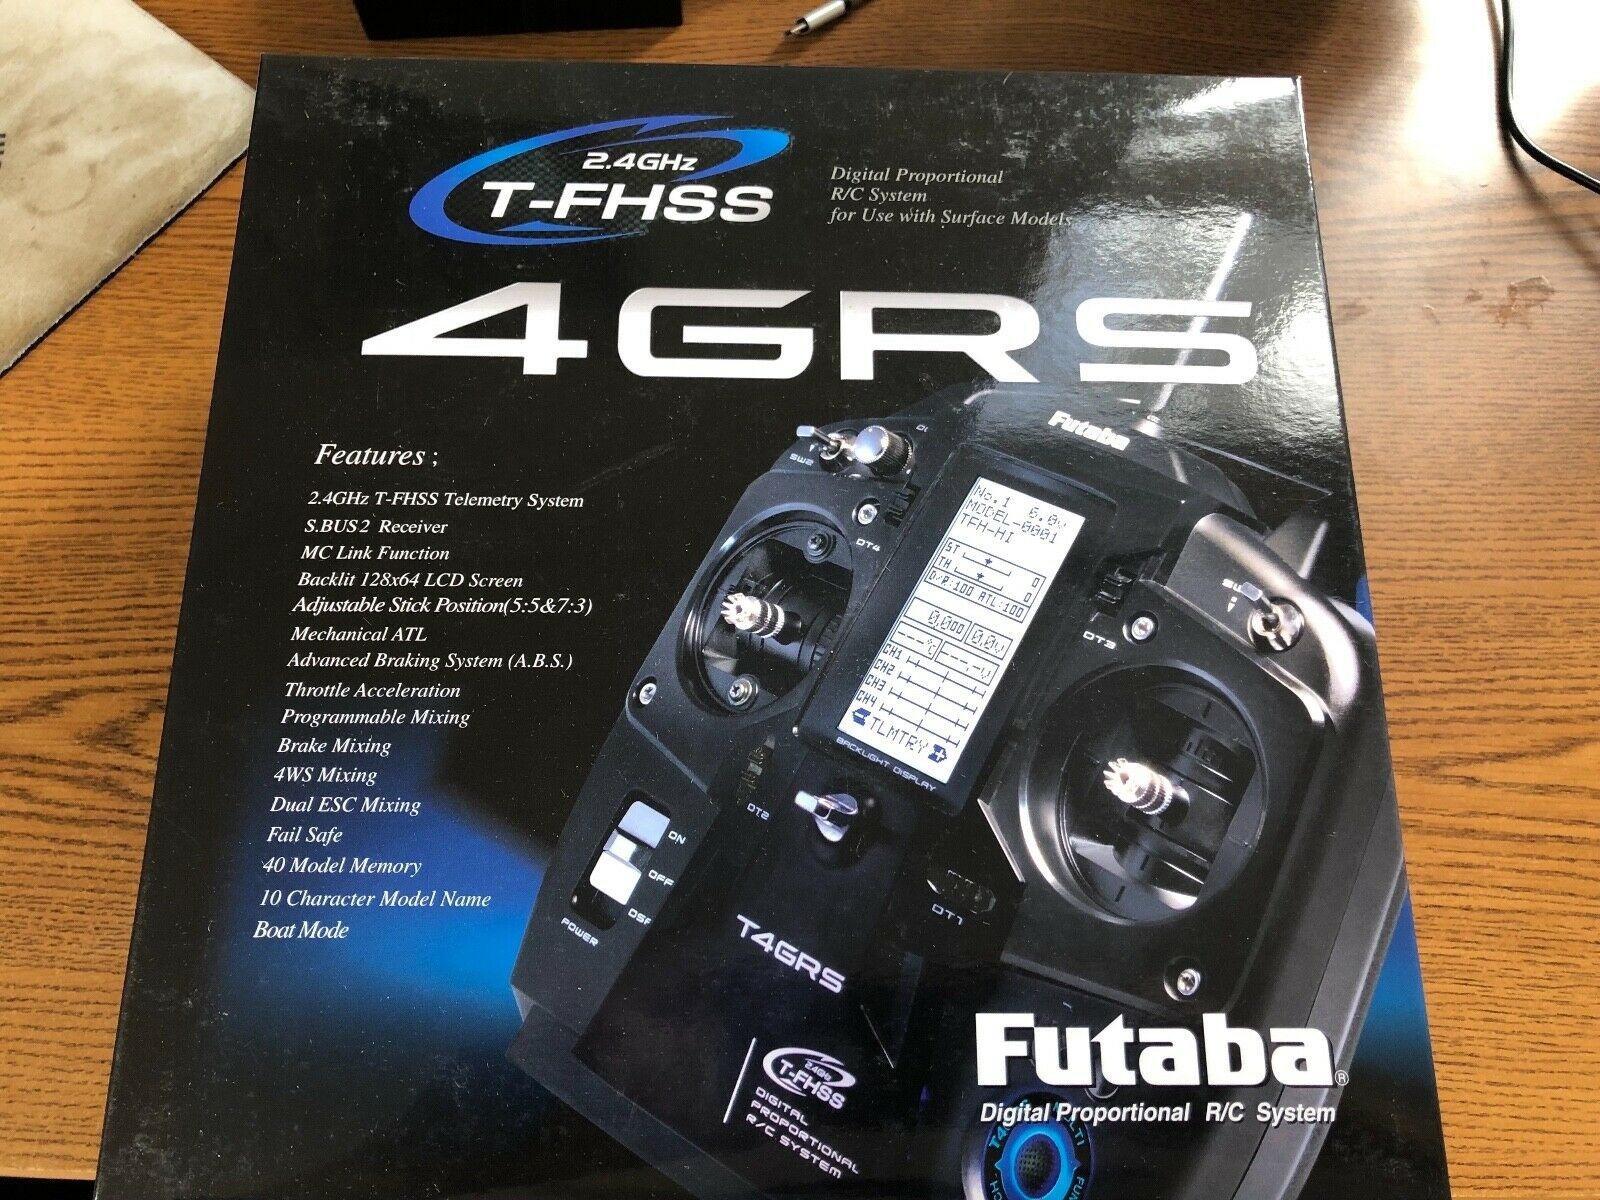 Futaba 4GRS 2.4GHz T-FHSS superficie sistema de radio con receptor R304SB